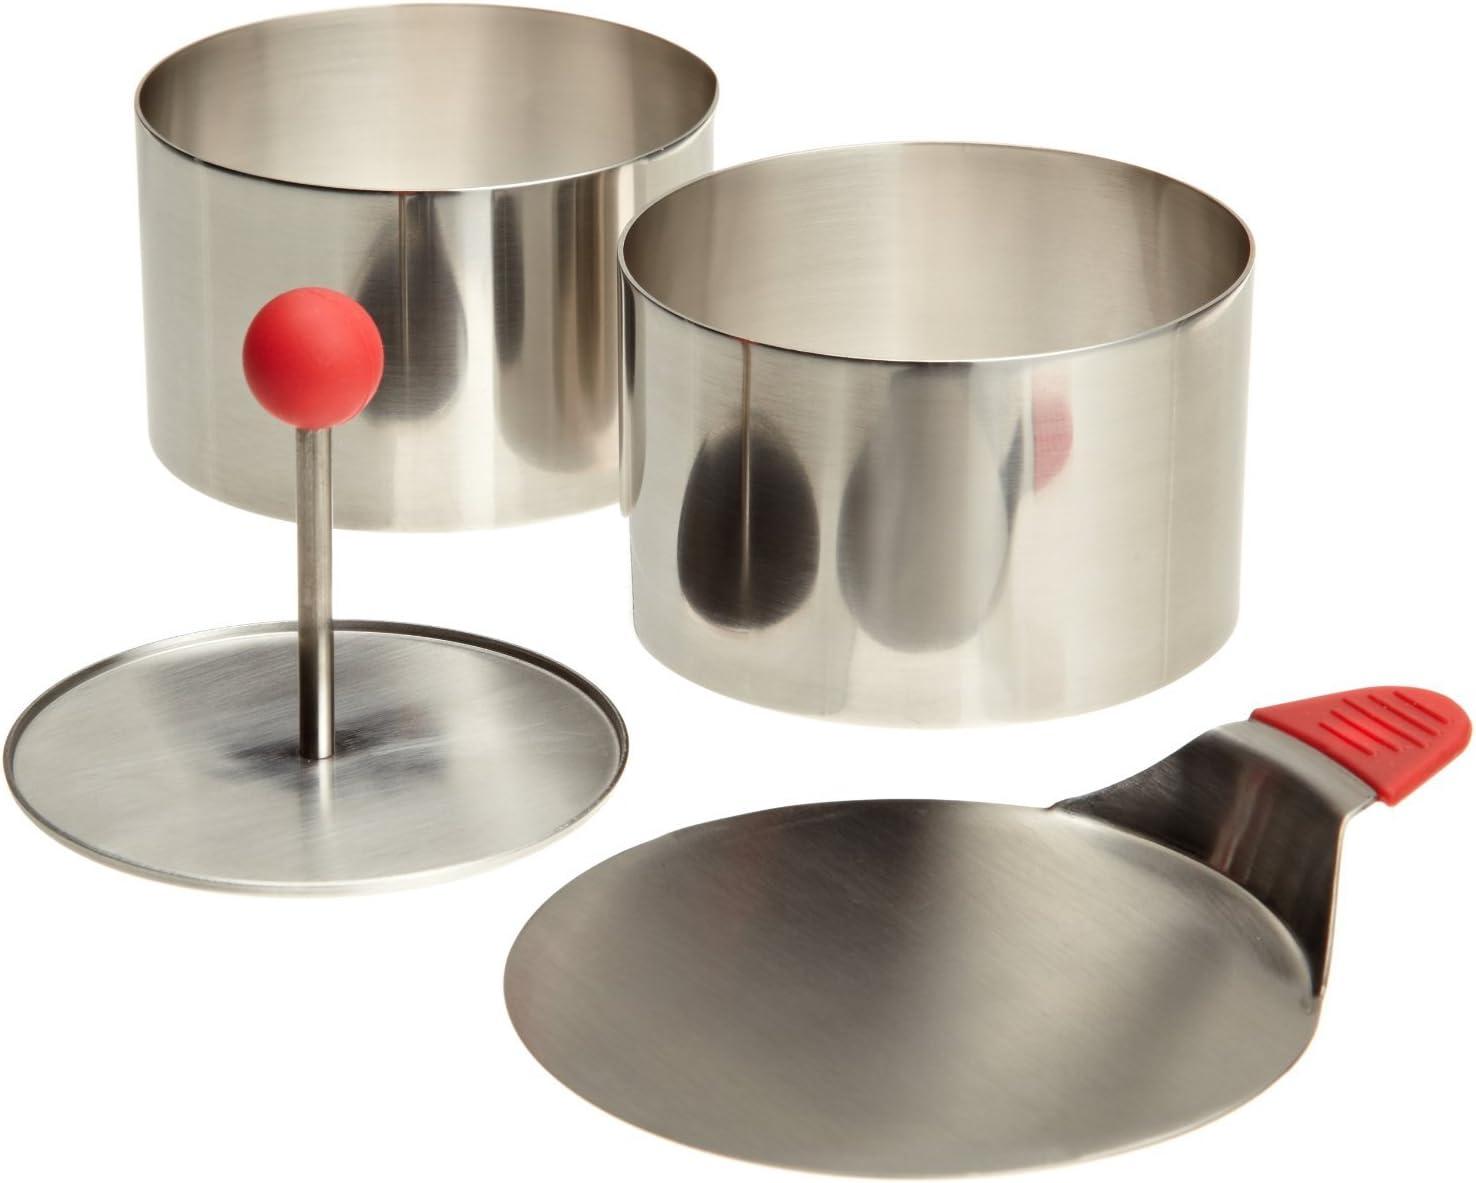 Ateco Food Rings Mold Set, 3-1/2-Inch (2)